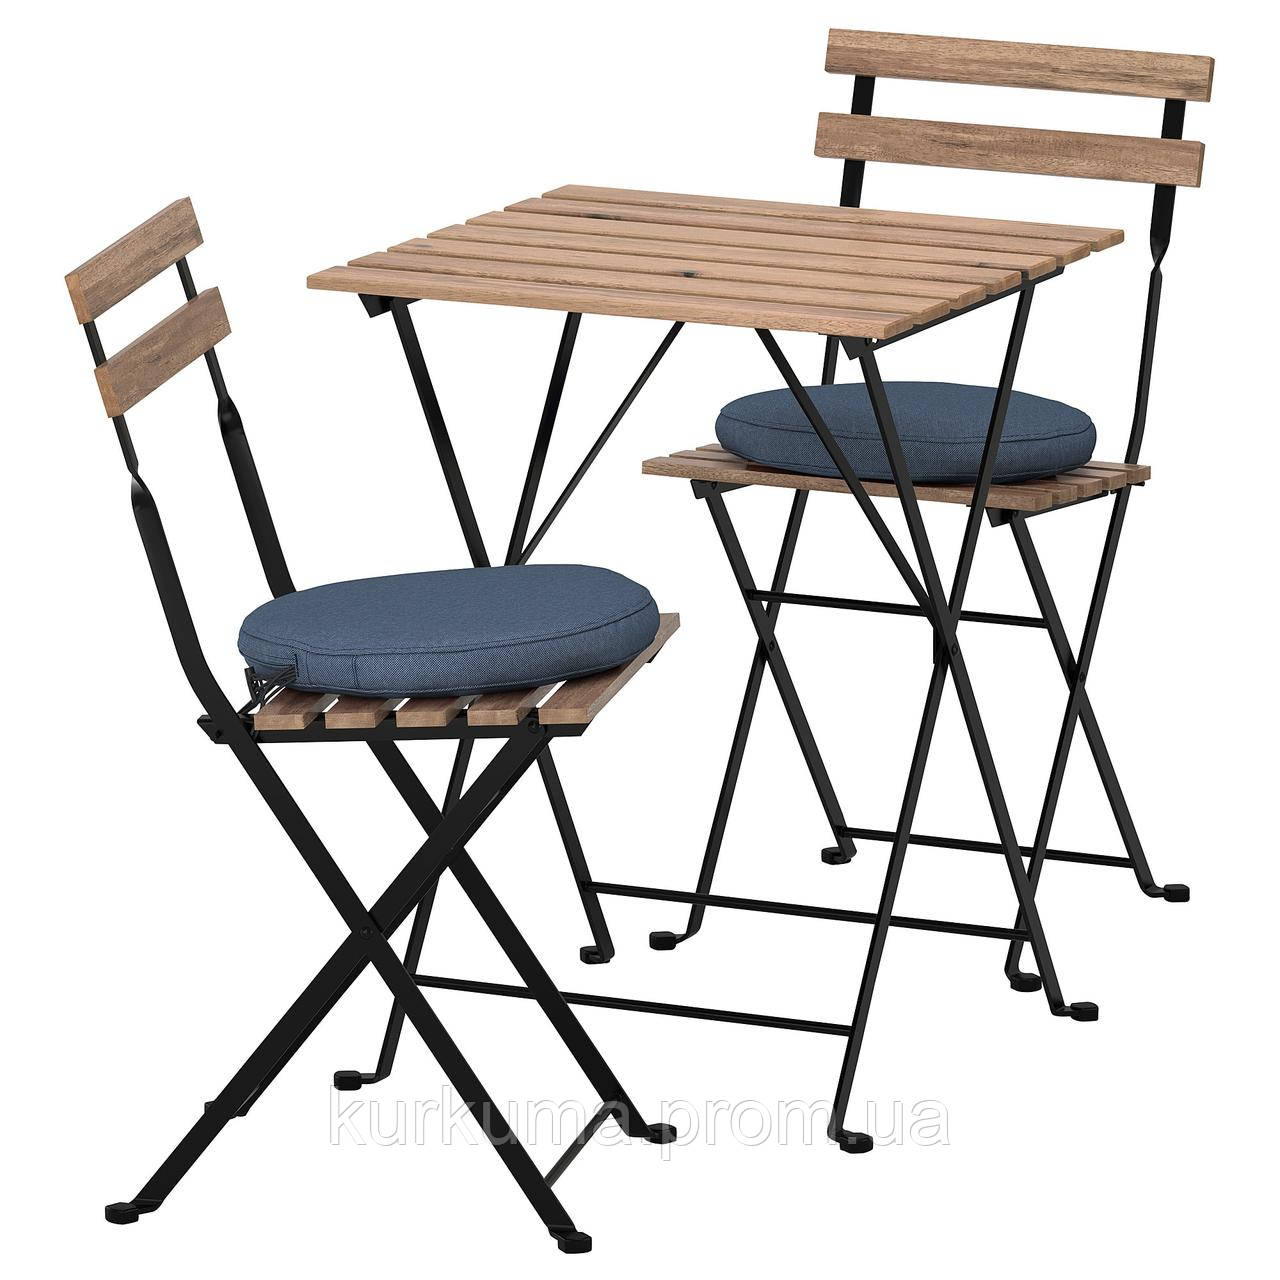 IKEA TARNO Садовый стол и 2 раскладных стула, серо-коричневый, Фрезен/дувхолмен синий  (792.708.81)